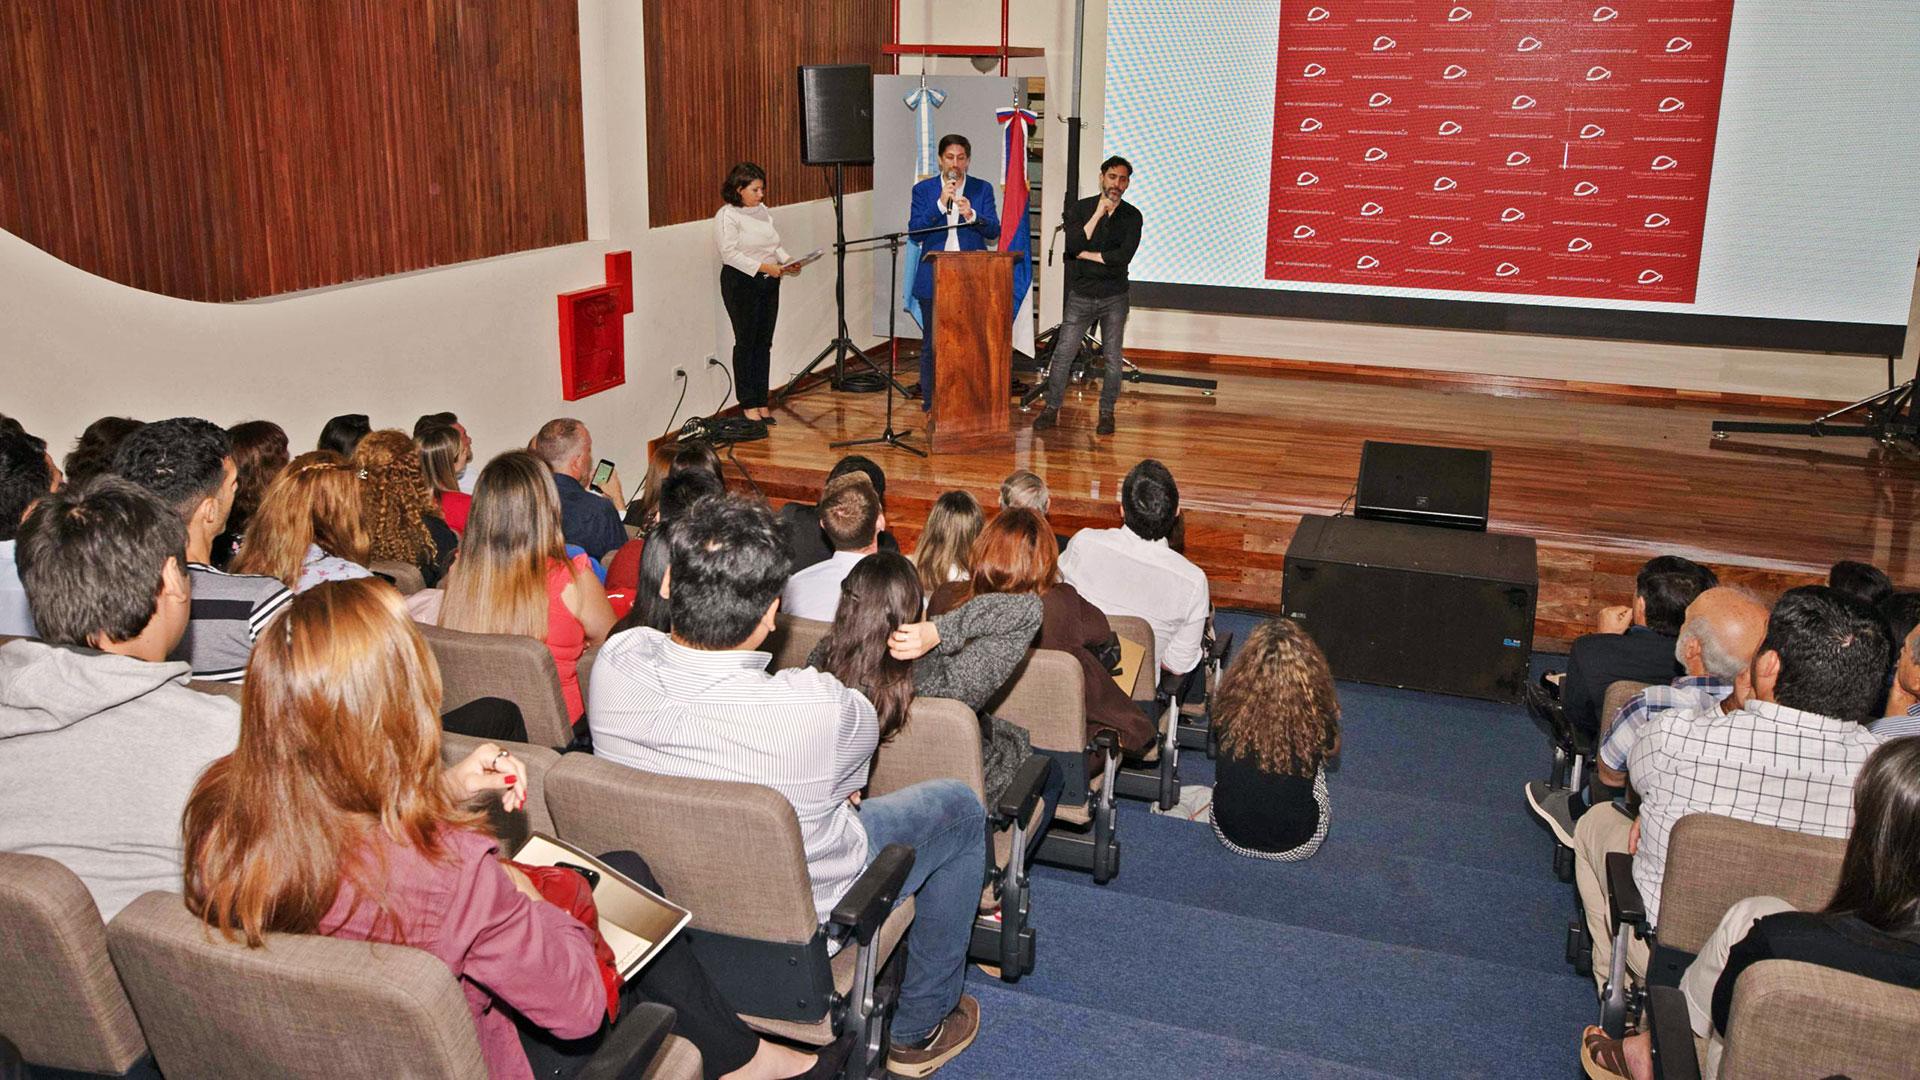 Auditorio del Instituto Hernando Arias Saavedra